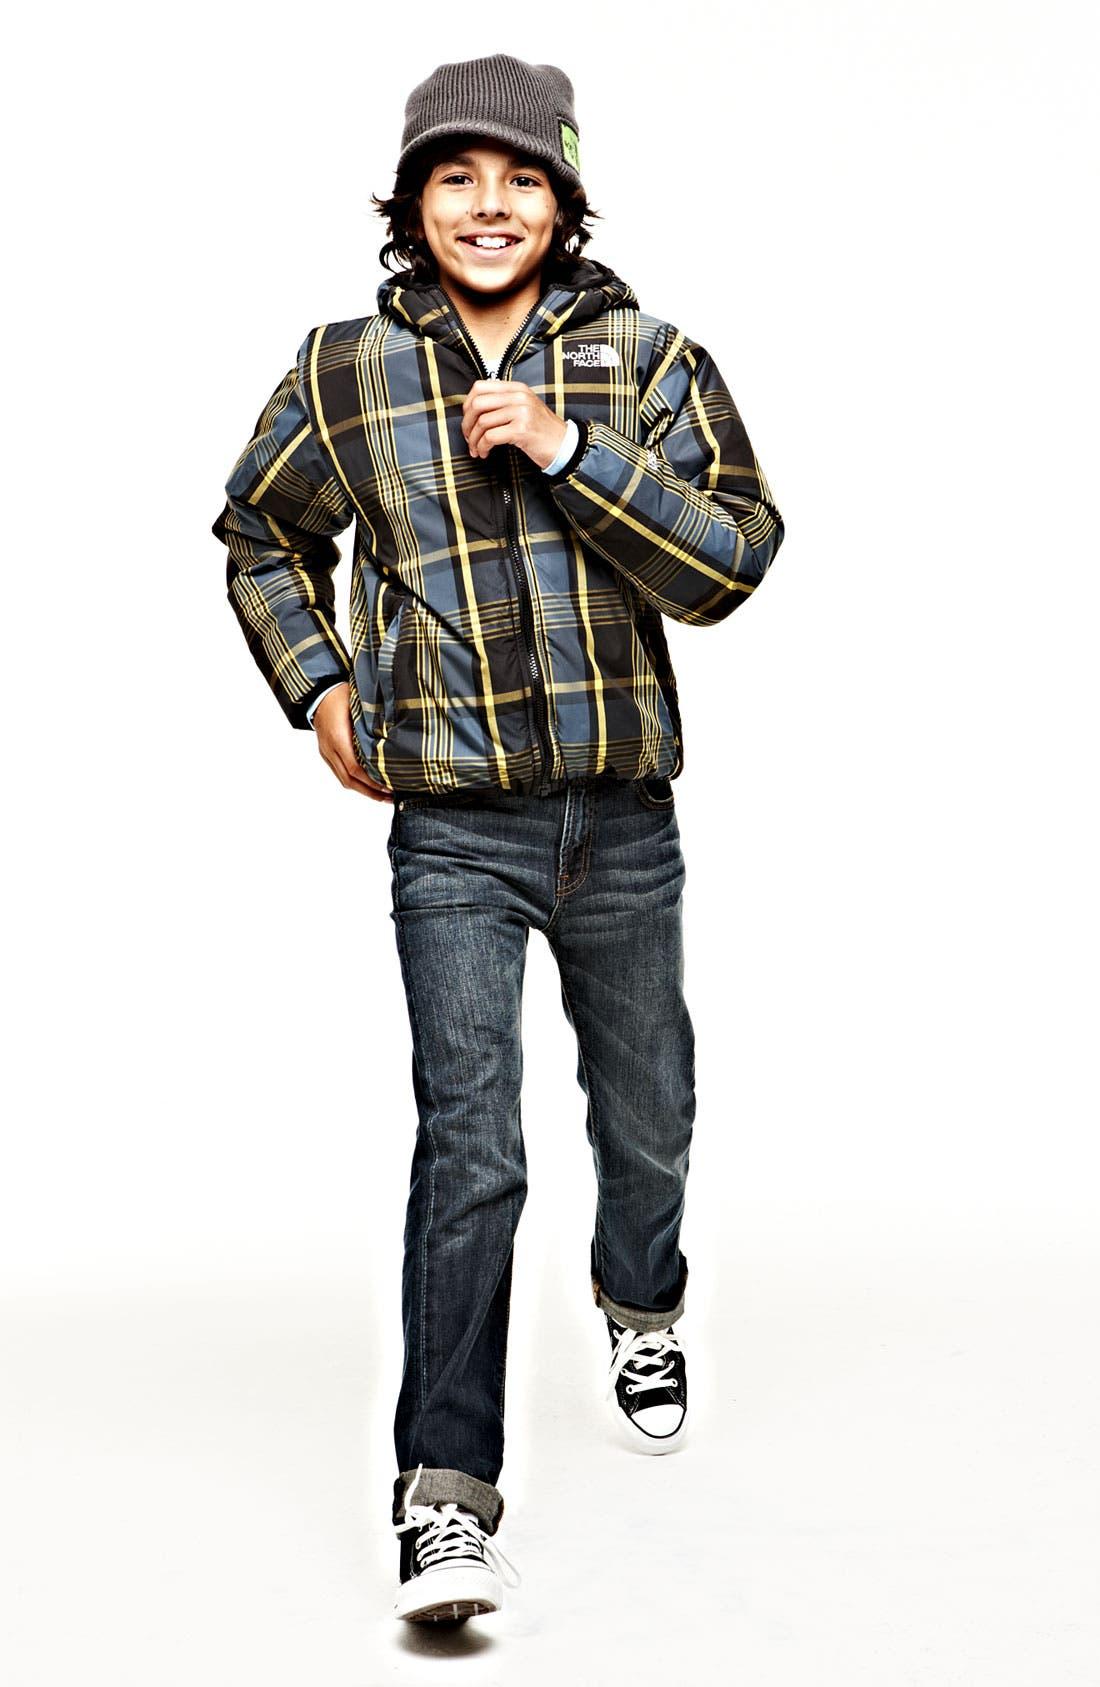 Main Image - Tucker + Tate Thermal T-Shirt, The North Face Down Jacket & Joe's Jeans (Big Boys)